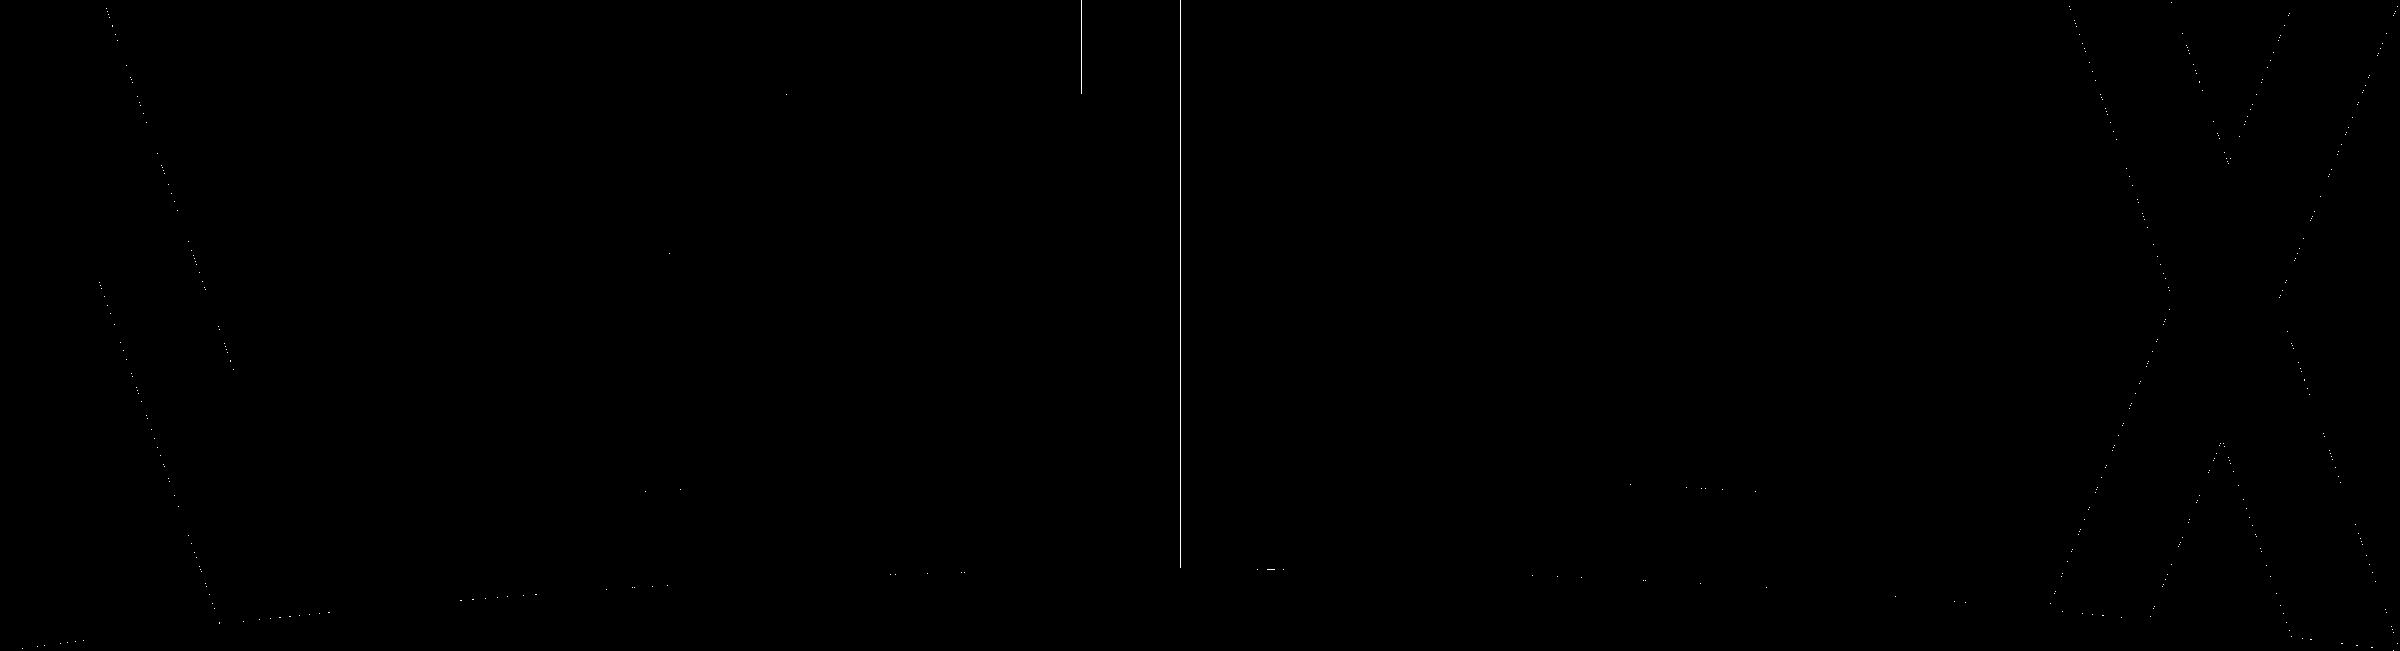 netflix-2-logo-black-and-white.png